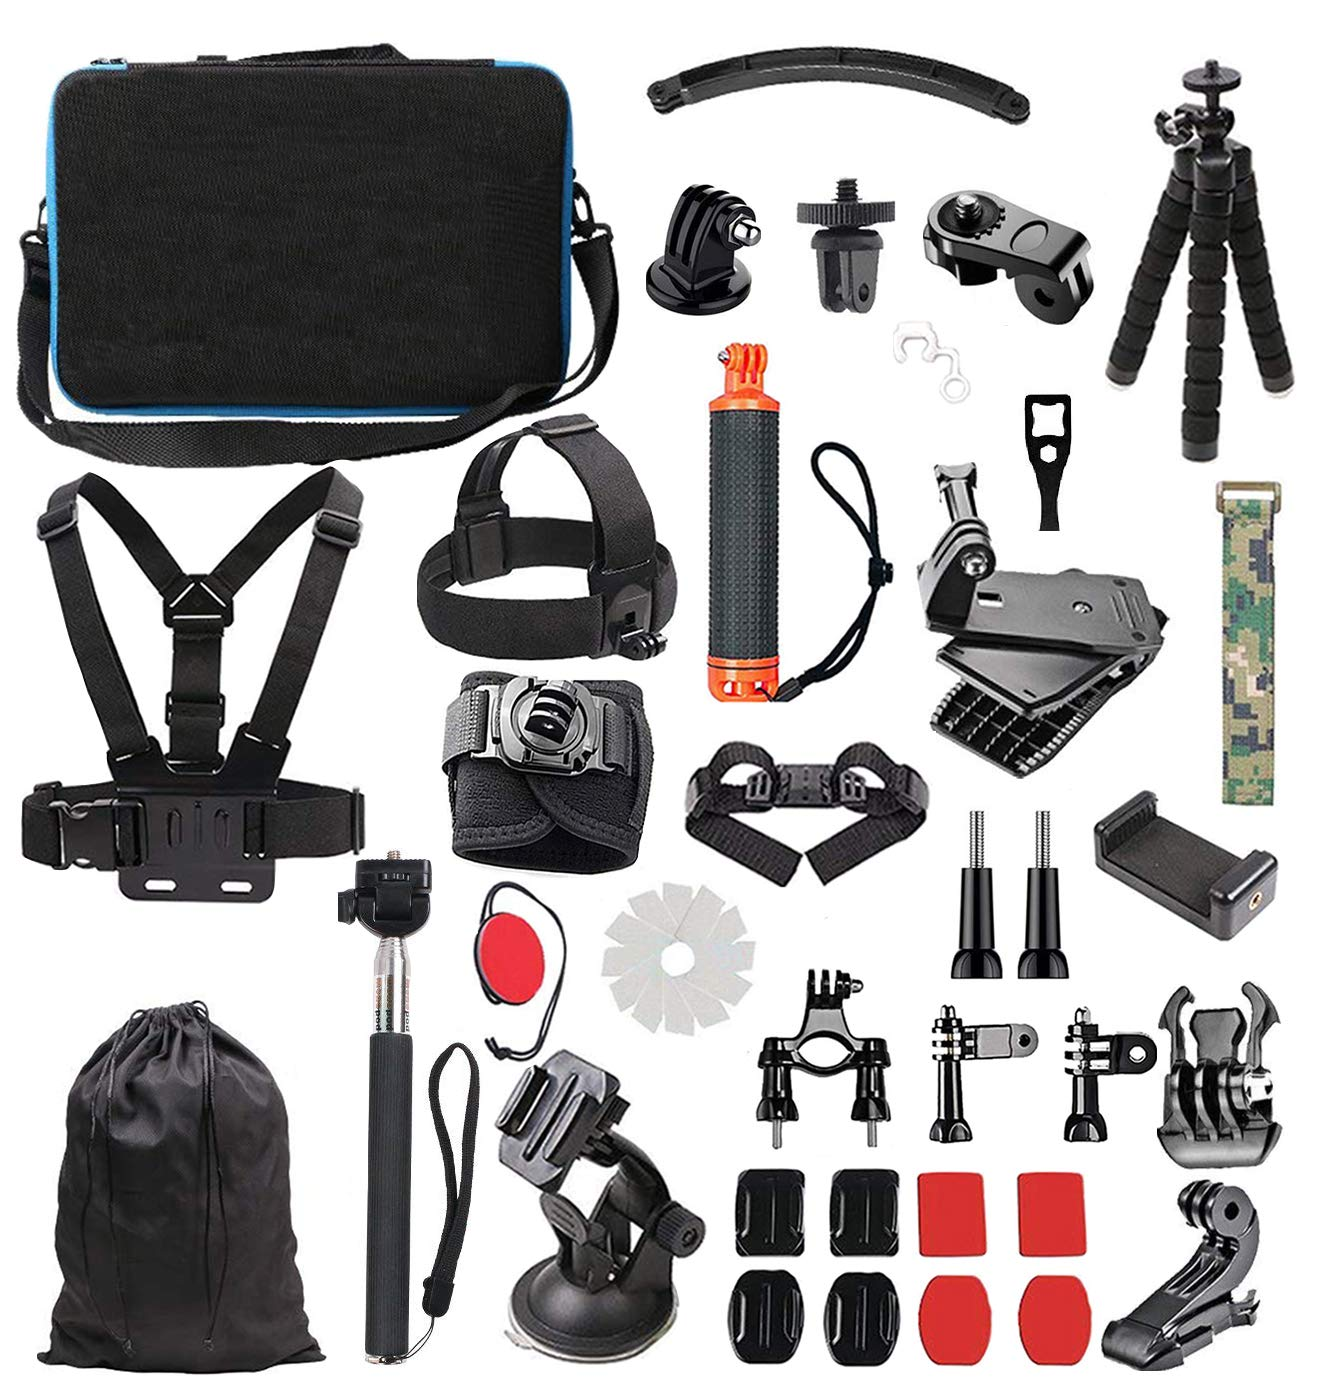 Lowpter Accessory Kit for GoPro Hero 7 6 5 4 3/ 3 2 1 Hero Session 5 Black AKASO EK7000 Apeman SJ4000 5000 6000 DBPOWER AKASO VicTsing Rollei Lightdow ,DJI OSMO and Sony Sports DV and More. by Lowpter